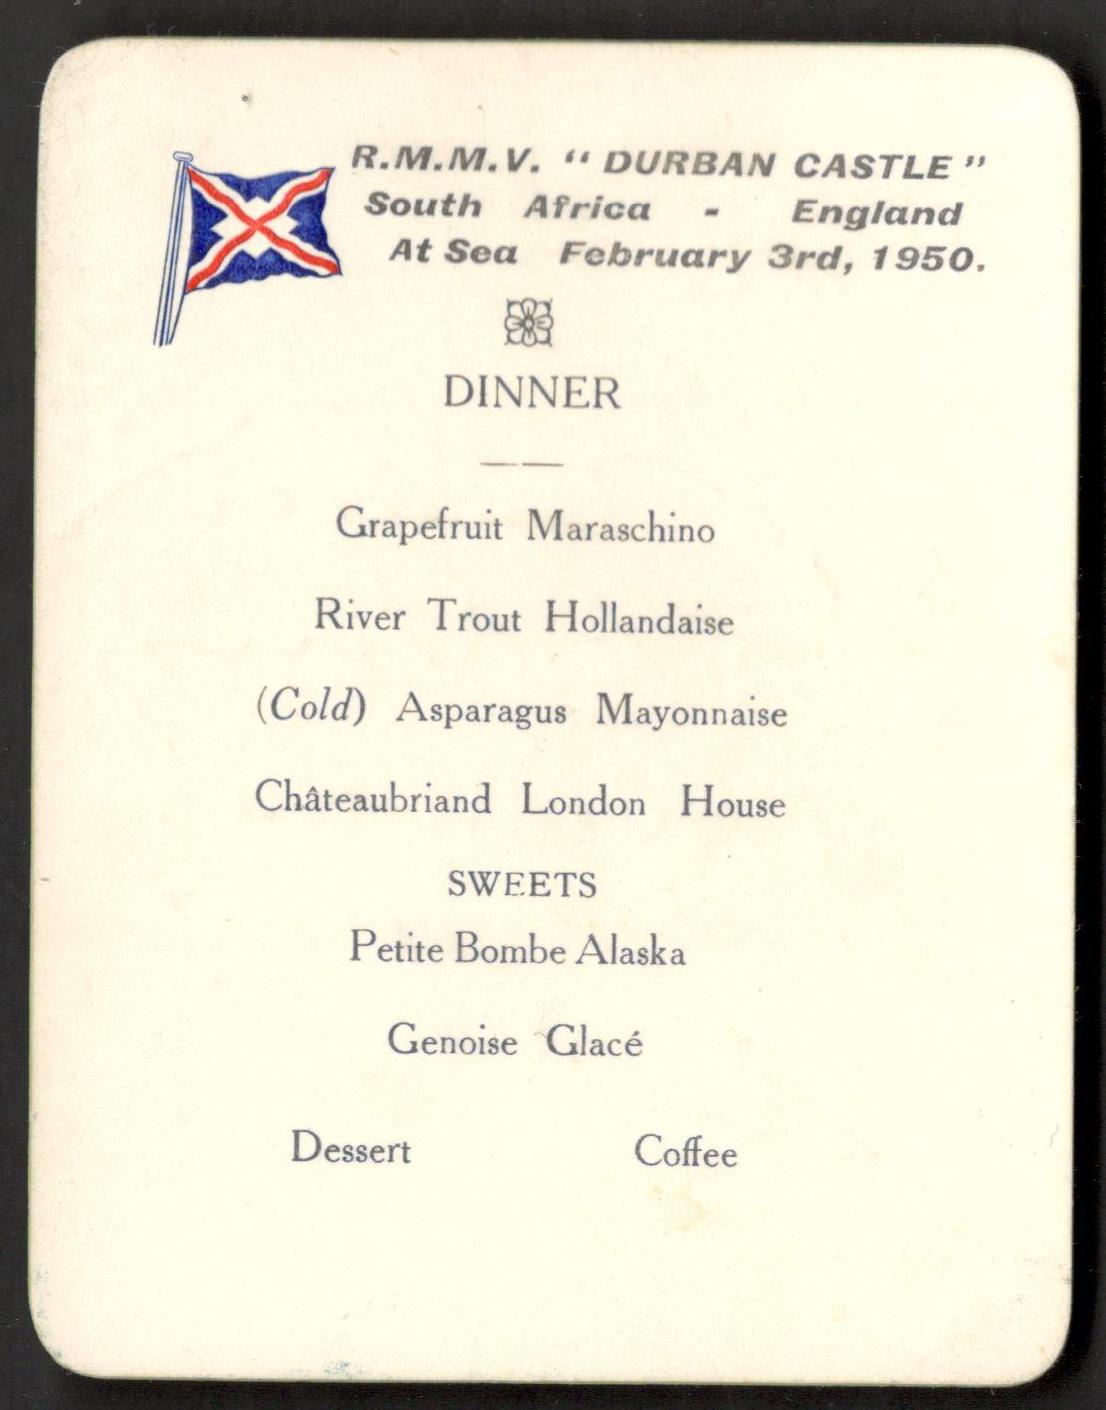 Lot 8 - R.M.M.V. DURBAN CASTLE SOUTH AFRICA - ENGLAND AT SEA 1950 SIGNED MENU CARD